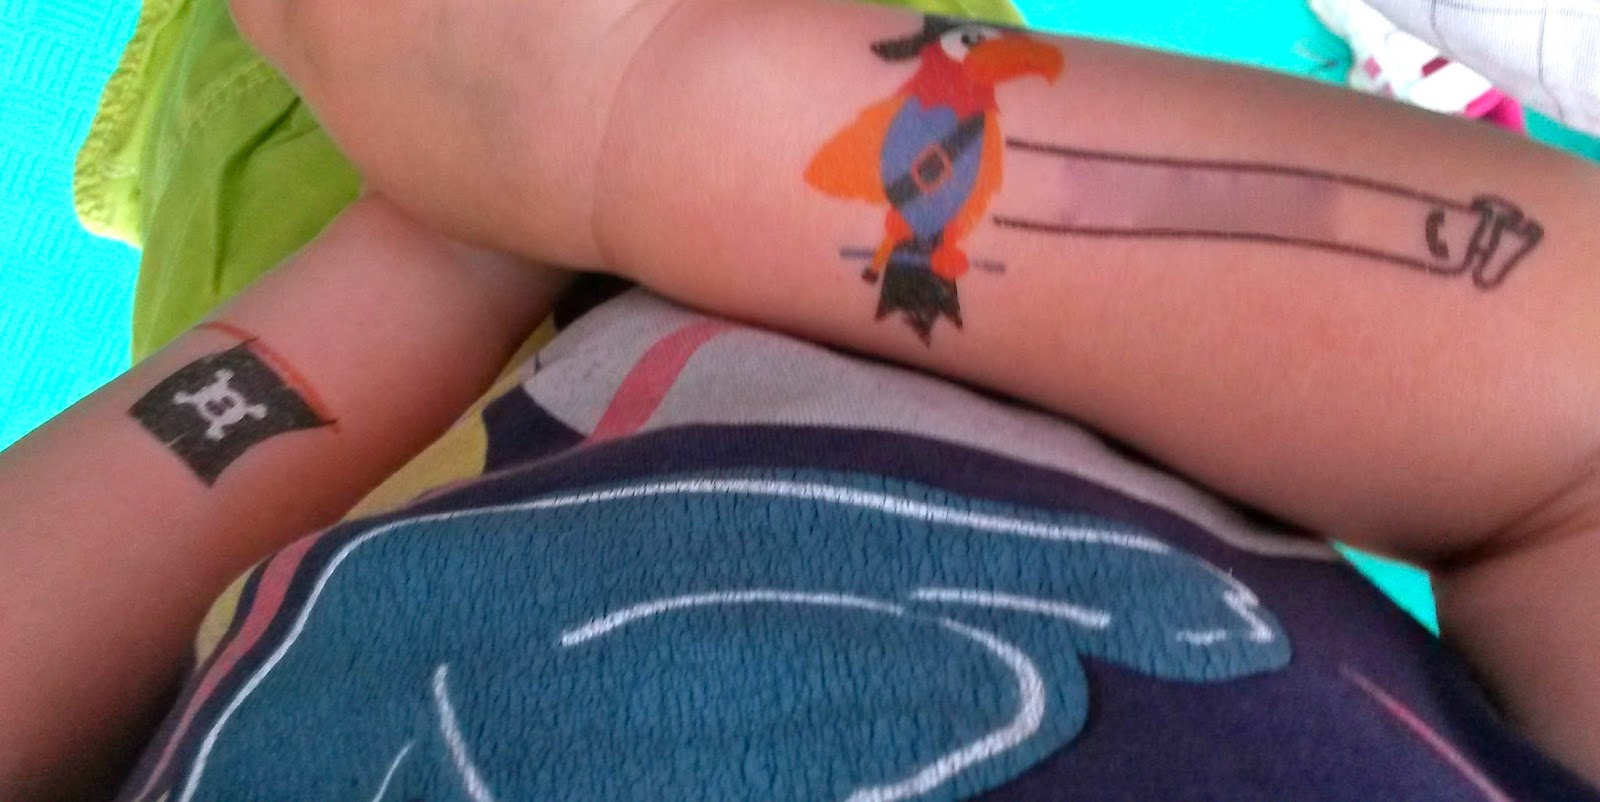 ecriture fine pour tatouage - ecriture fine pour tatouage Excessial Calligraphie